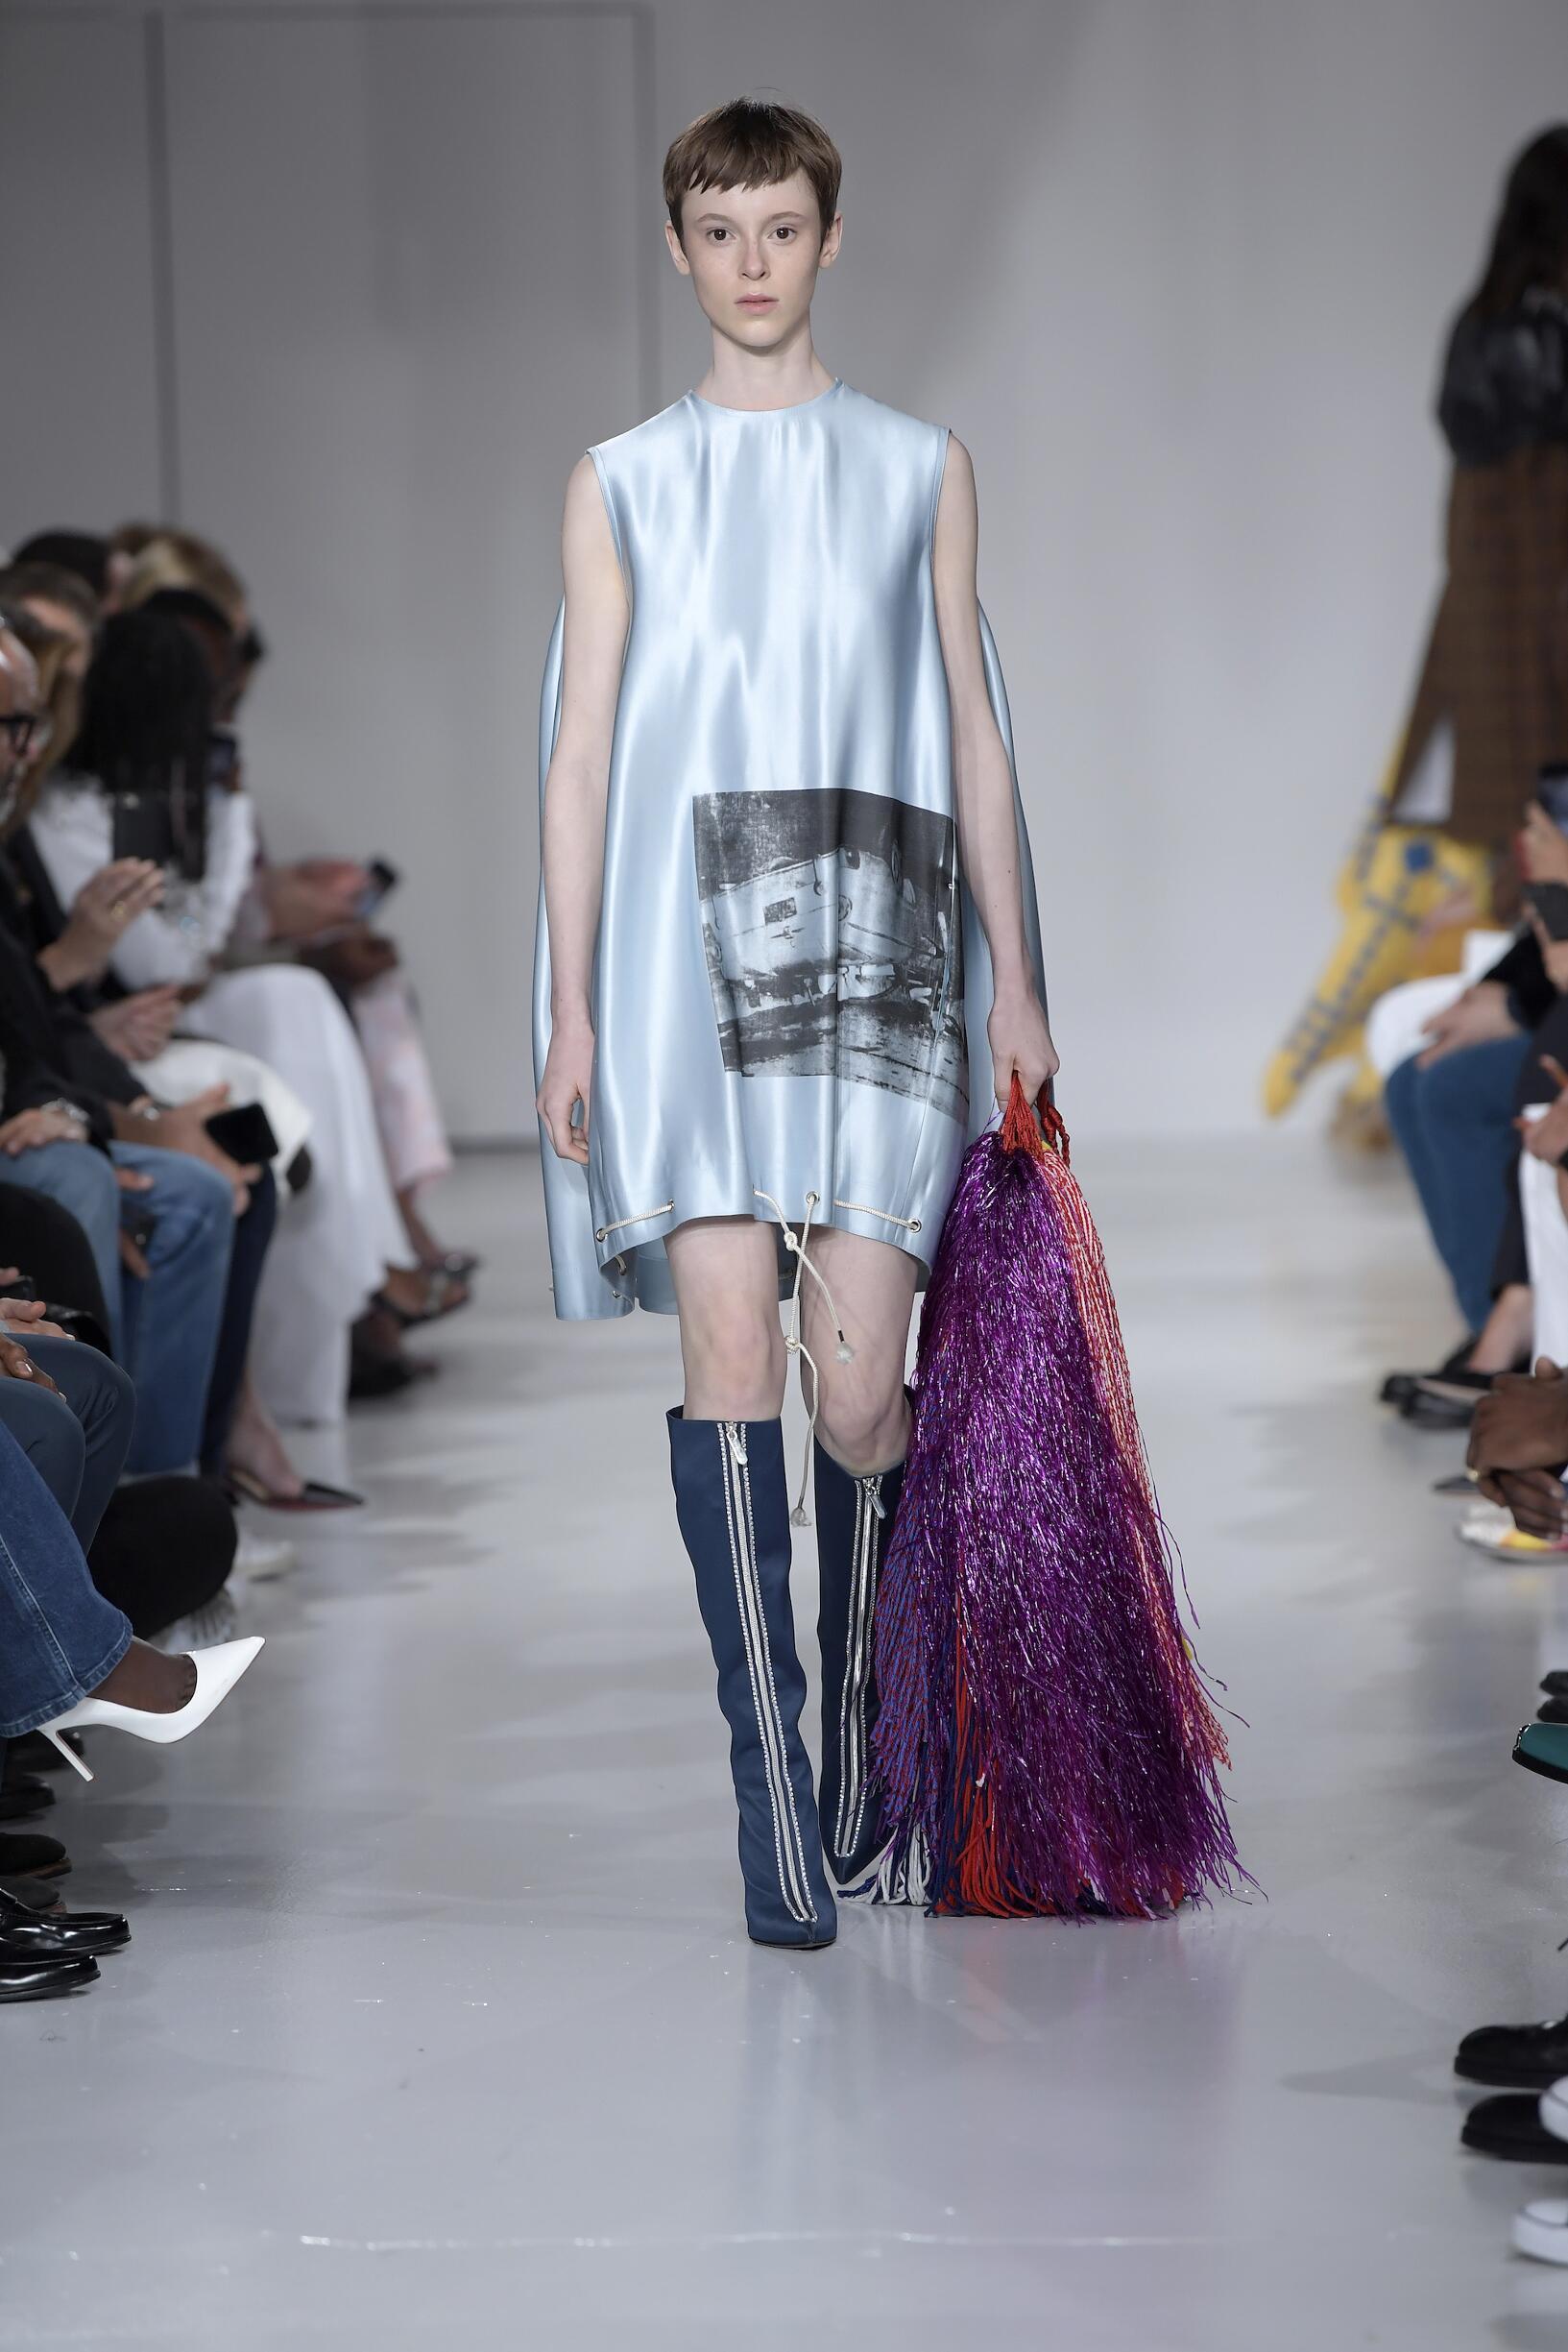 Calvin Klein 205W39NYC SS 2018 Womenswear